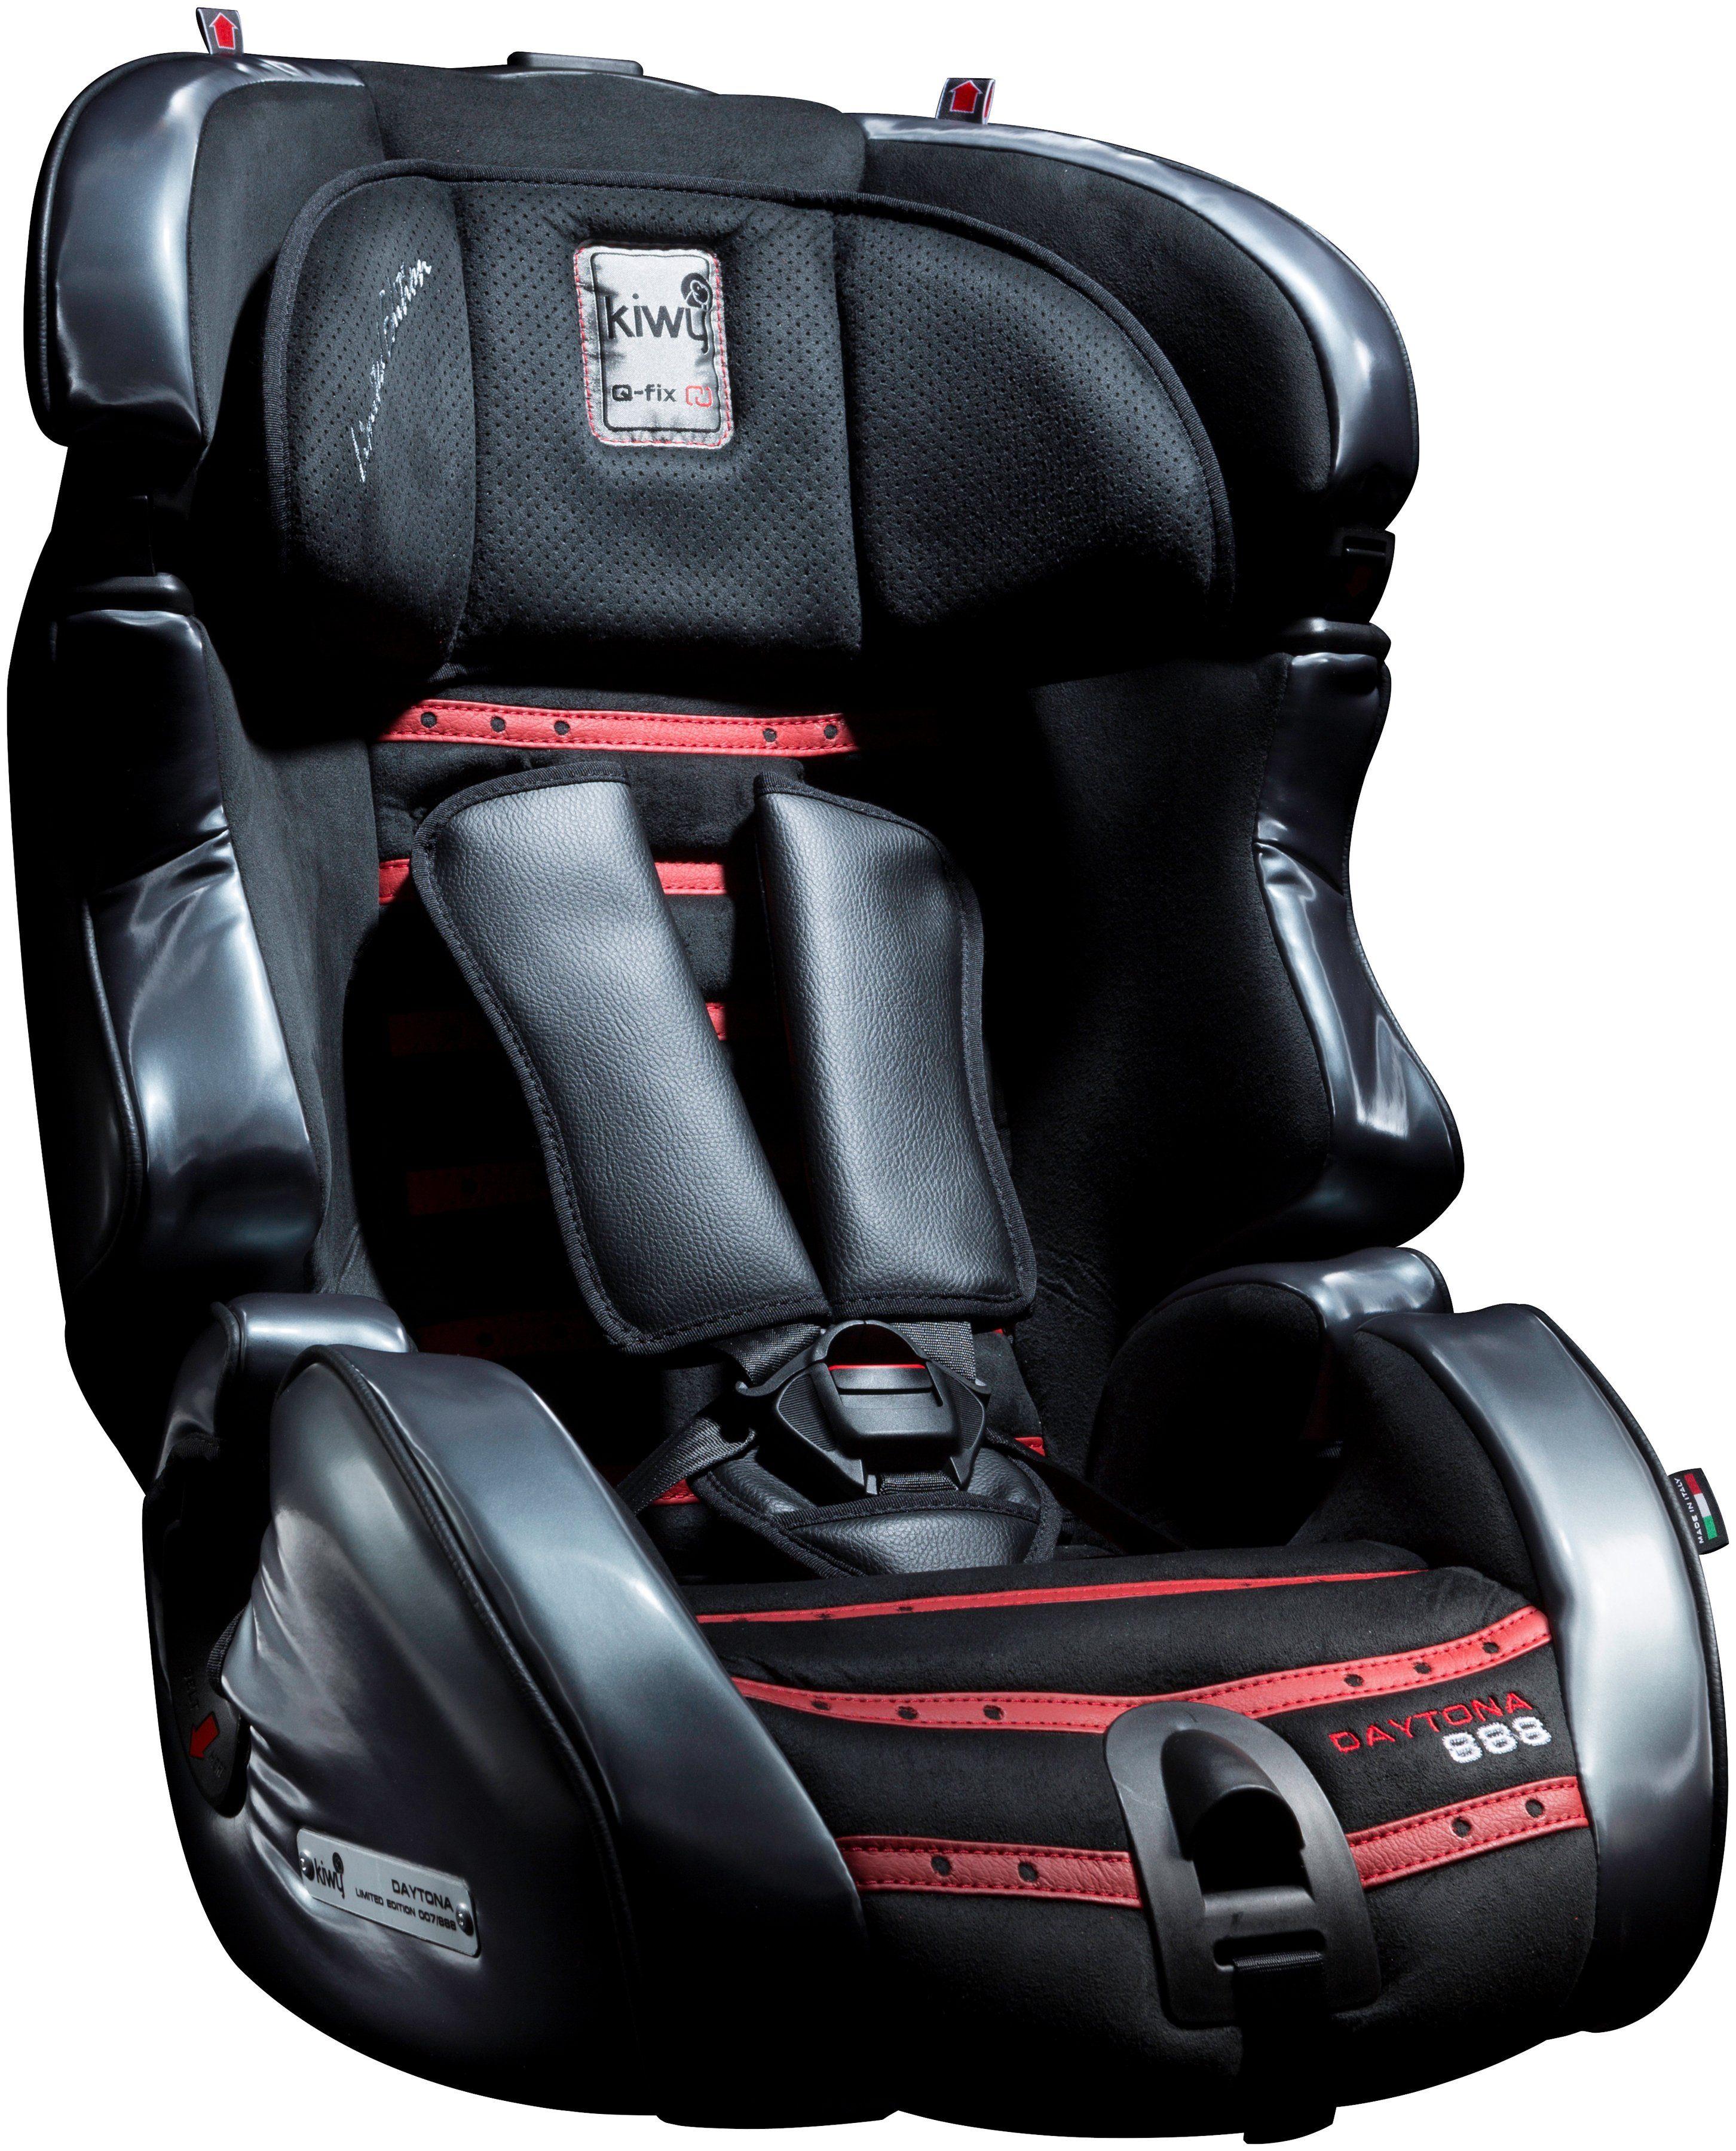 KIWY Kindersitz »SLF123 Daytona«, 9 - 36 kg, Isofix